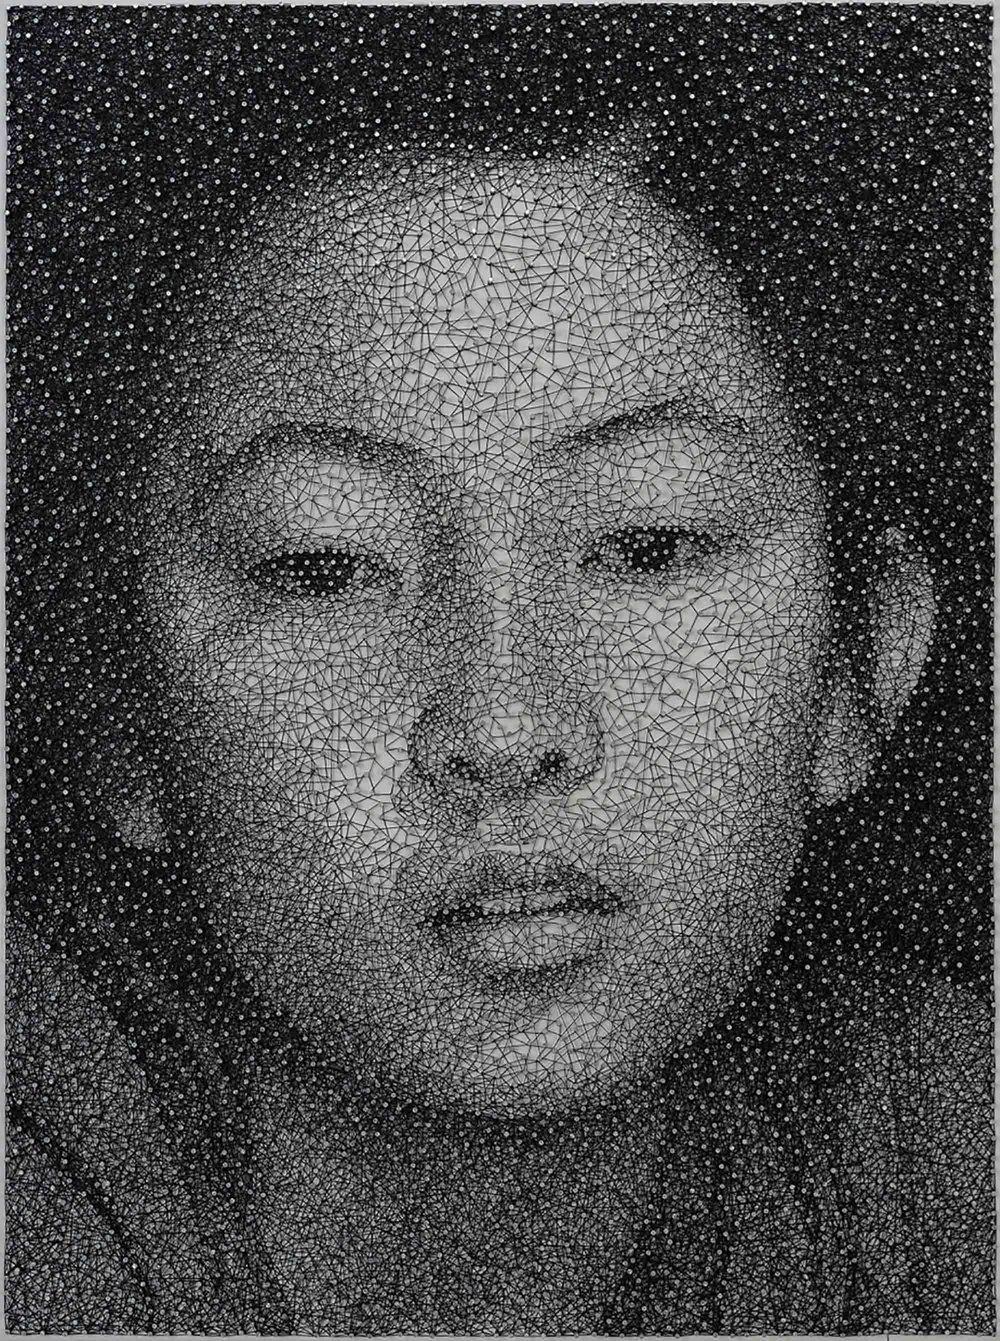 Kumi Yamashita_4.jpg